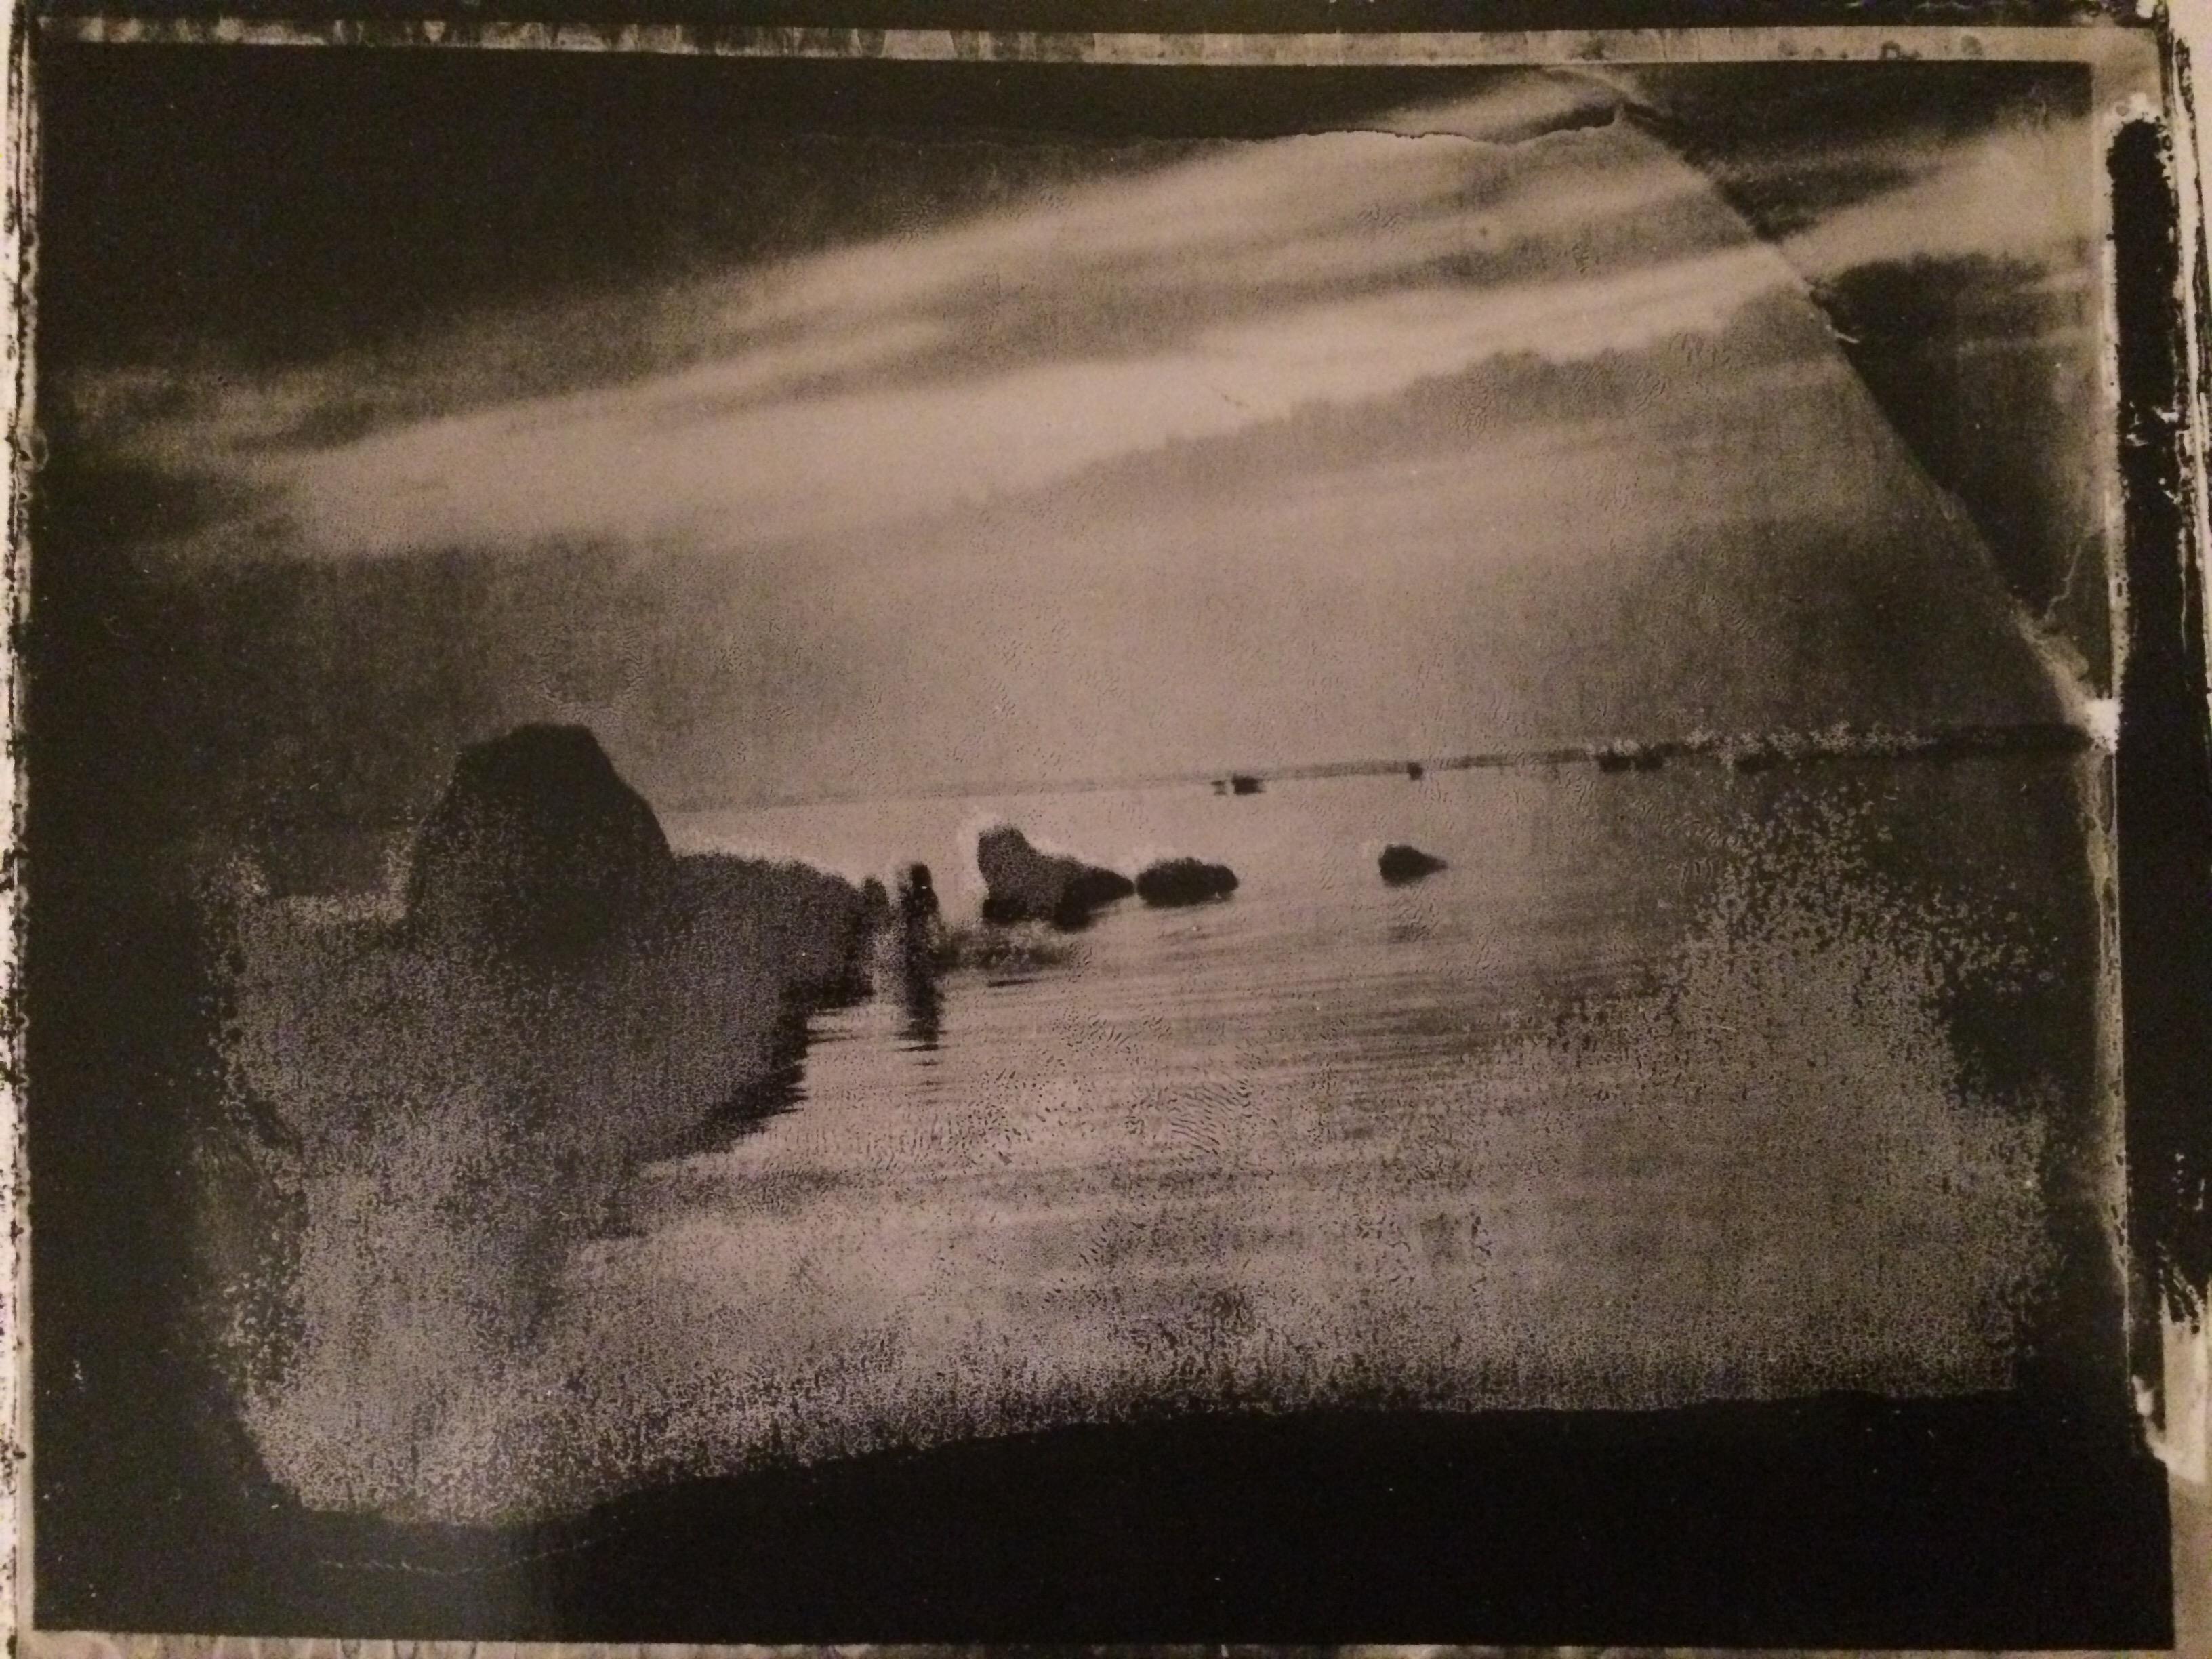 ©  Cato Lein Titel: Northern Silence 2  BildmŒått: 36x28 cm Teknik: Baryt, Lithprint Montering: Säljs oinramad Upplaga 3 +1AP Signerad: Ja   Pris: SEK 8500